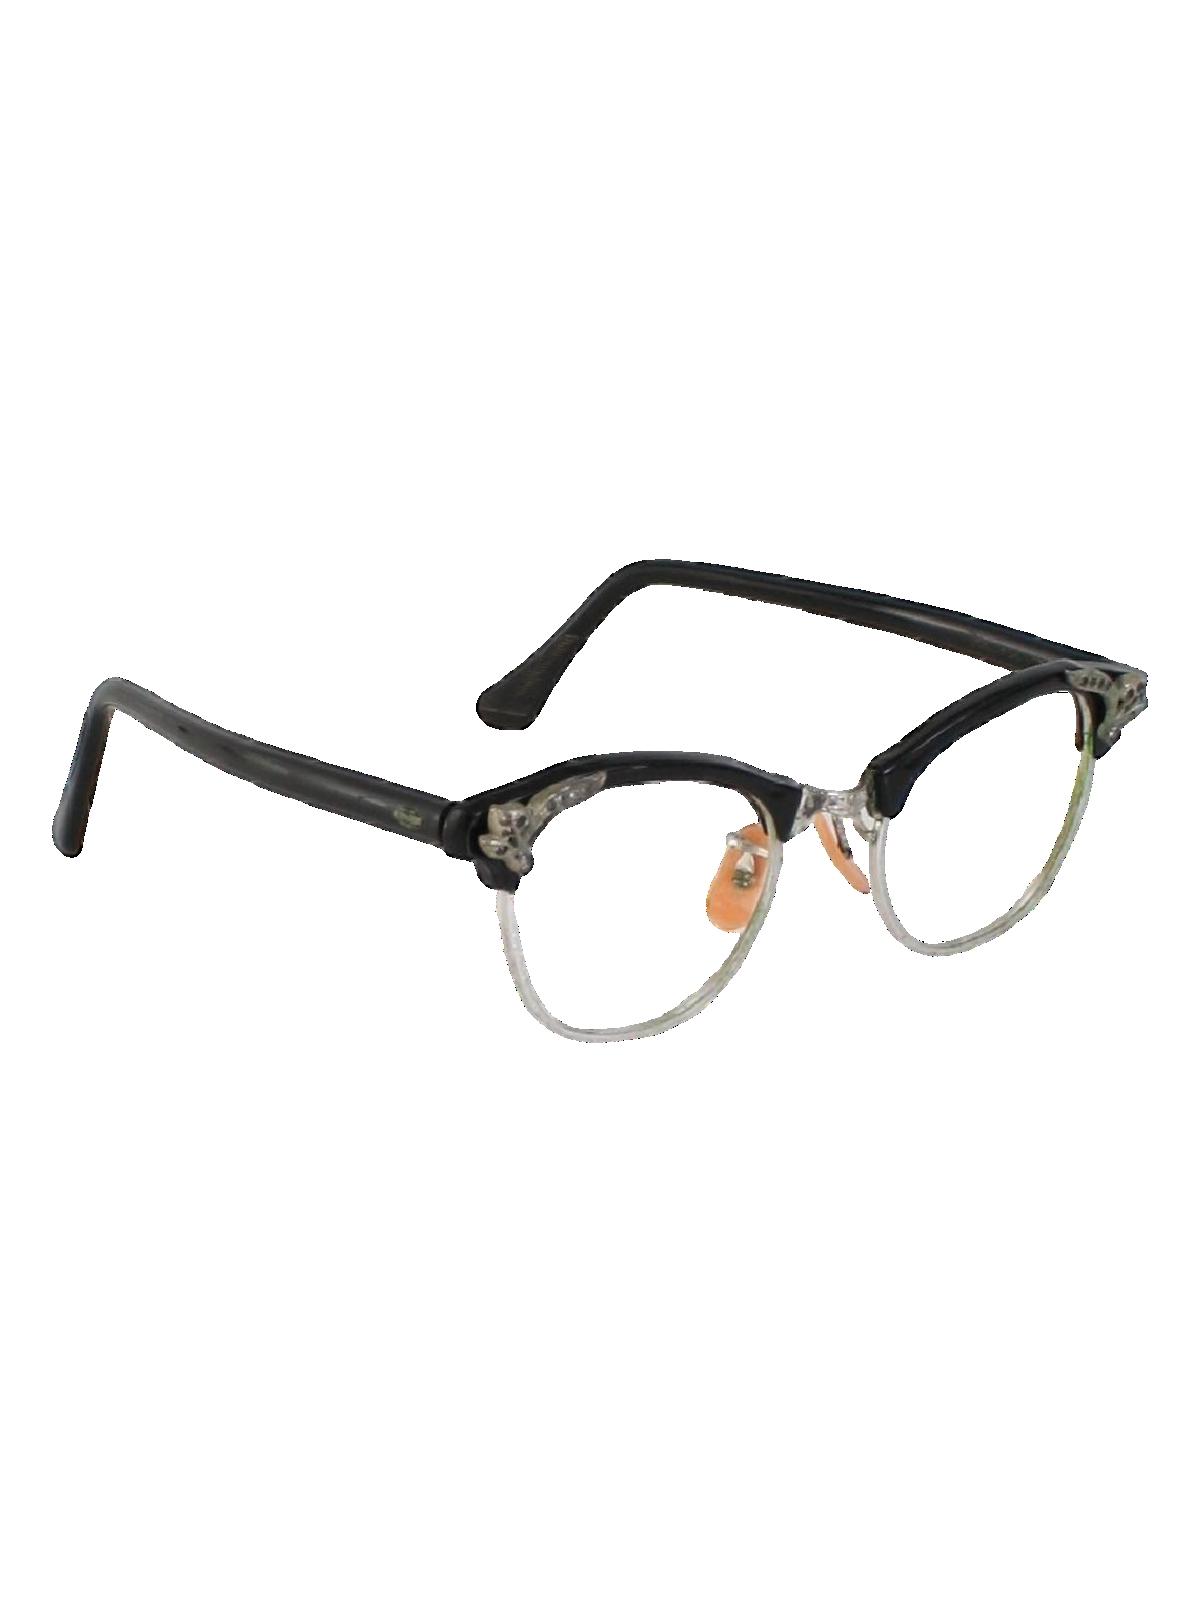 50 S Vintage Glasses 50s Art Craft Womens Black Plastic